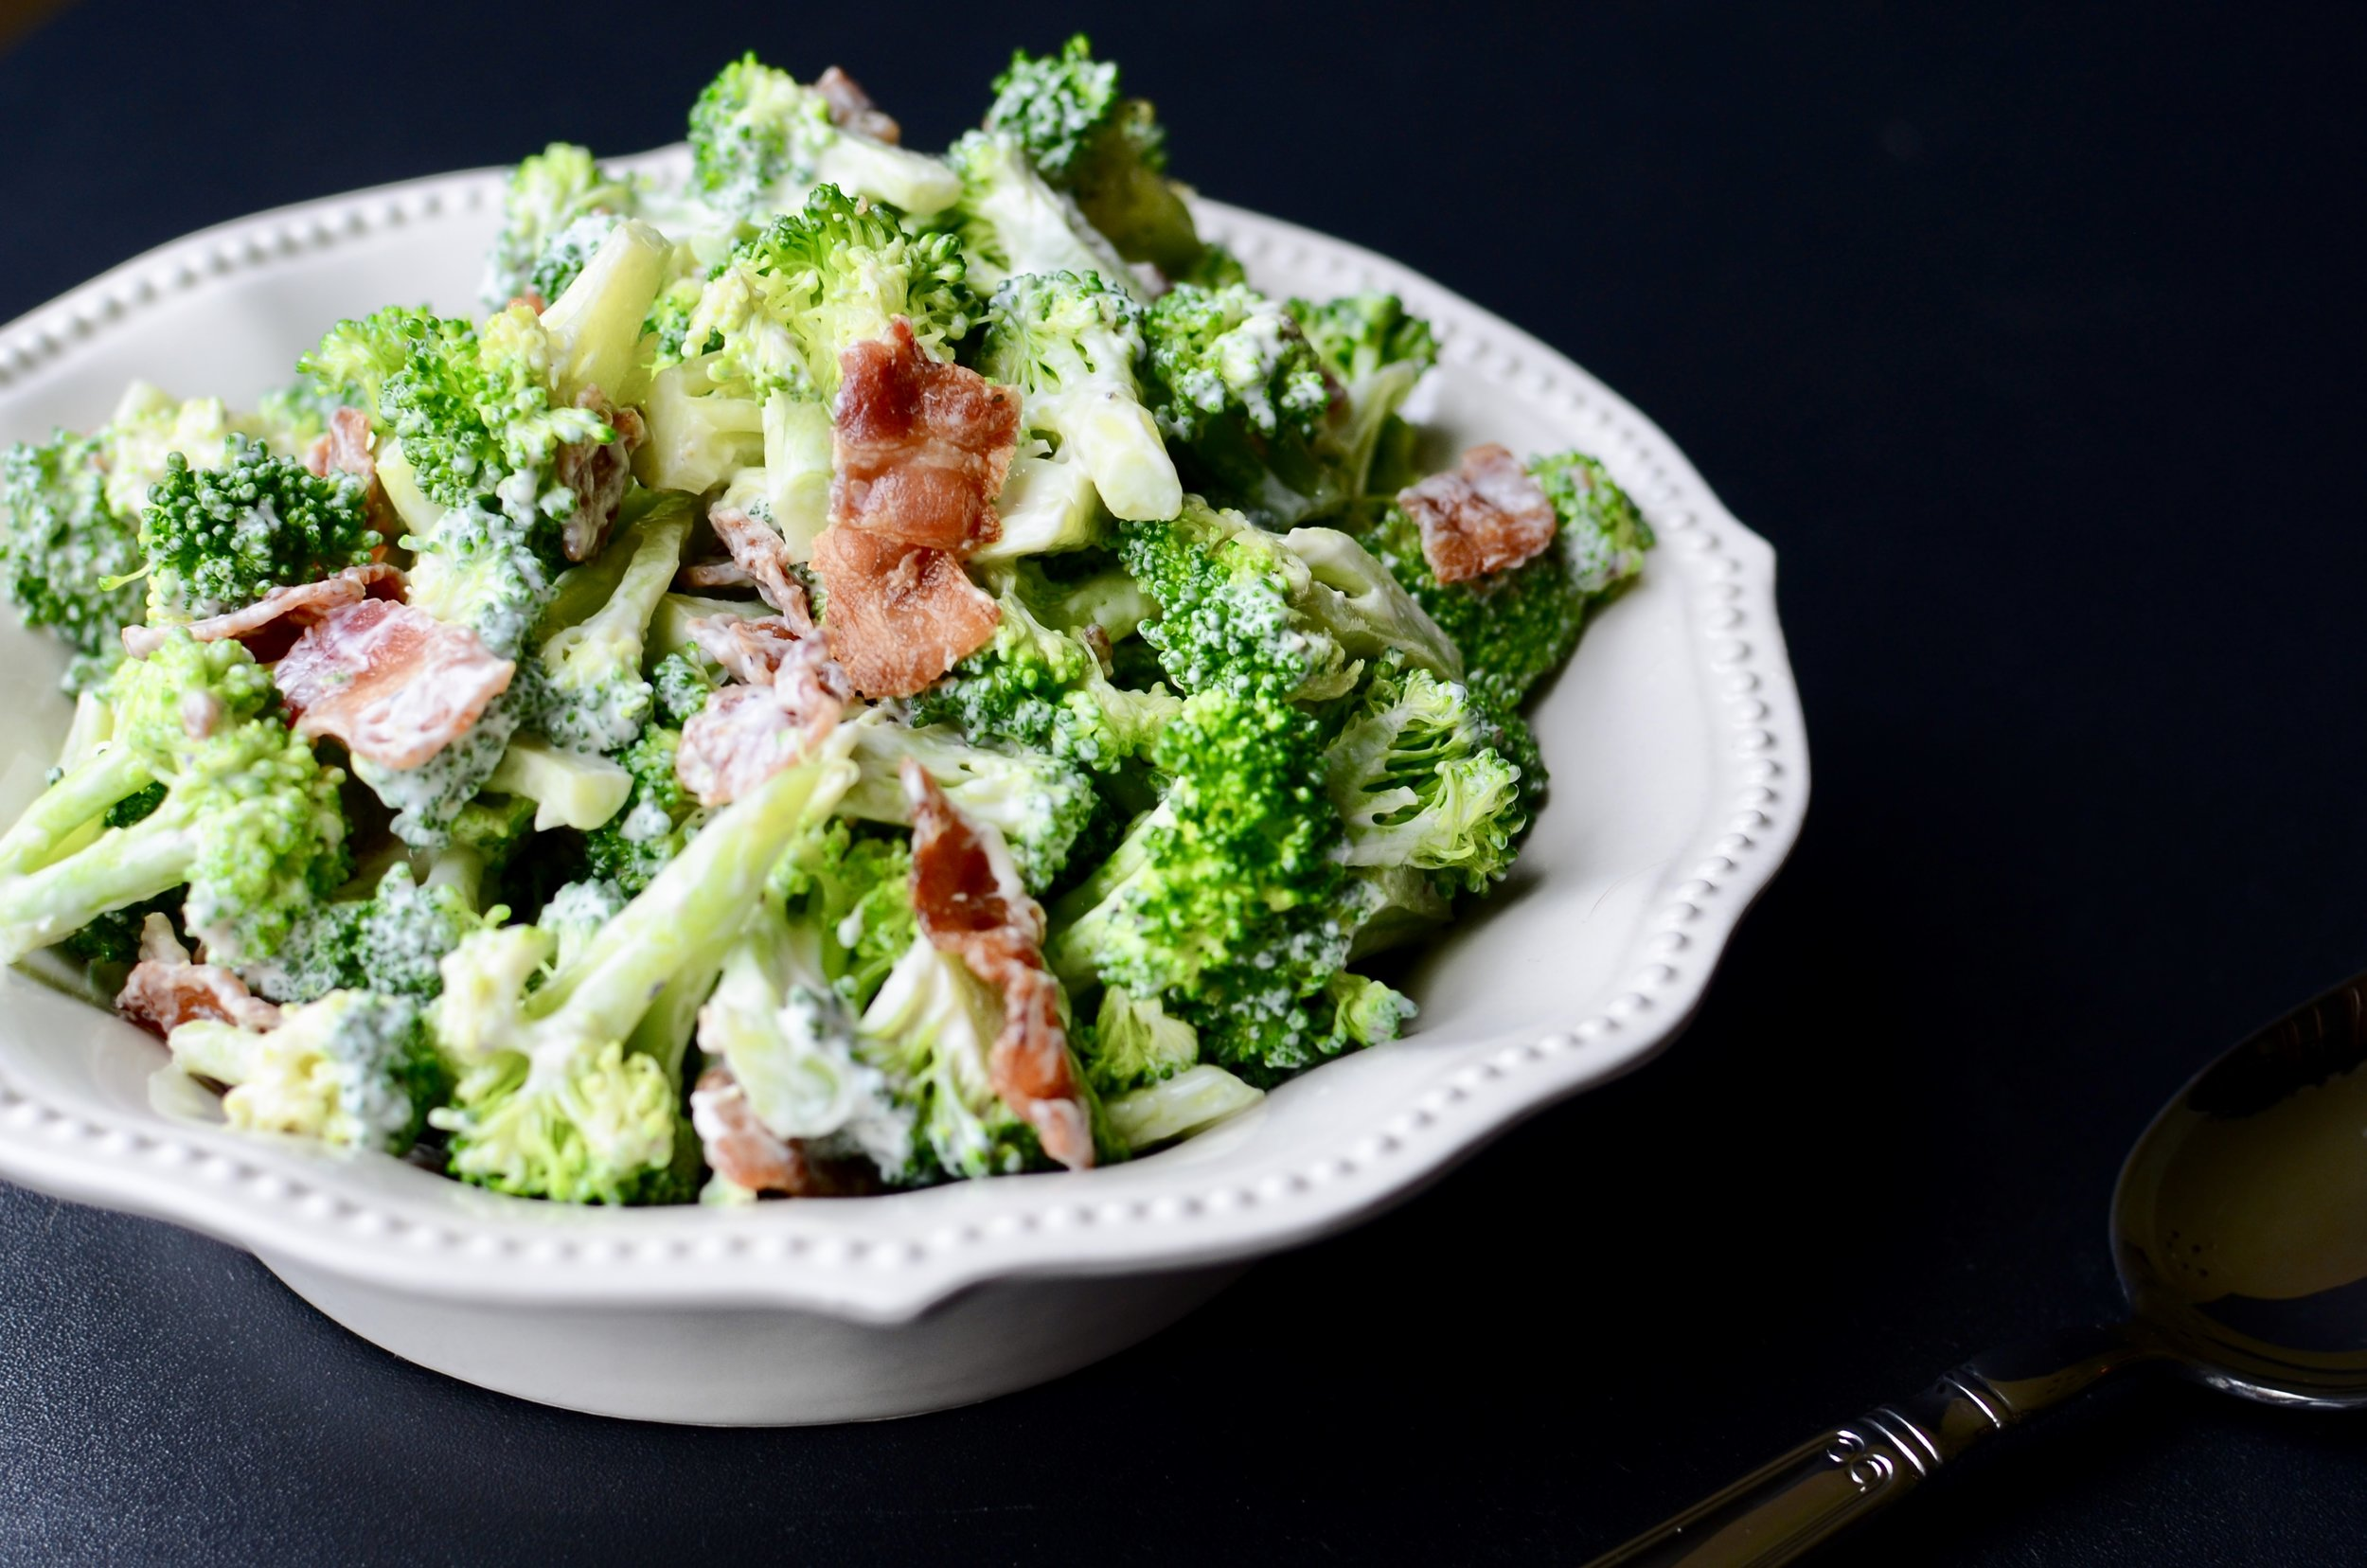 ButterYum - Cold Broccoli Salad (Keto). How to make broccoli salad. broccoli and bacon salad. Keto broccoli salad with bacon.